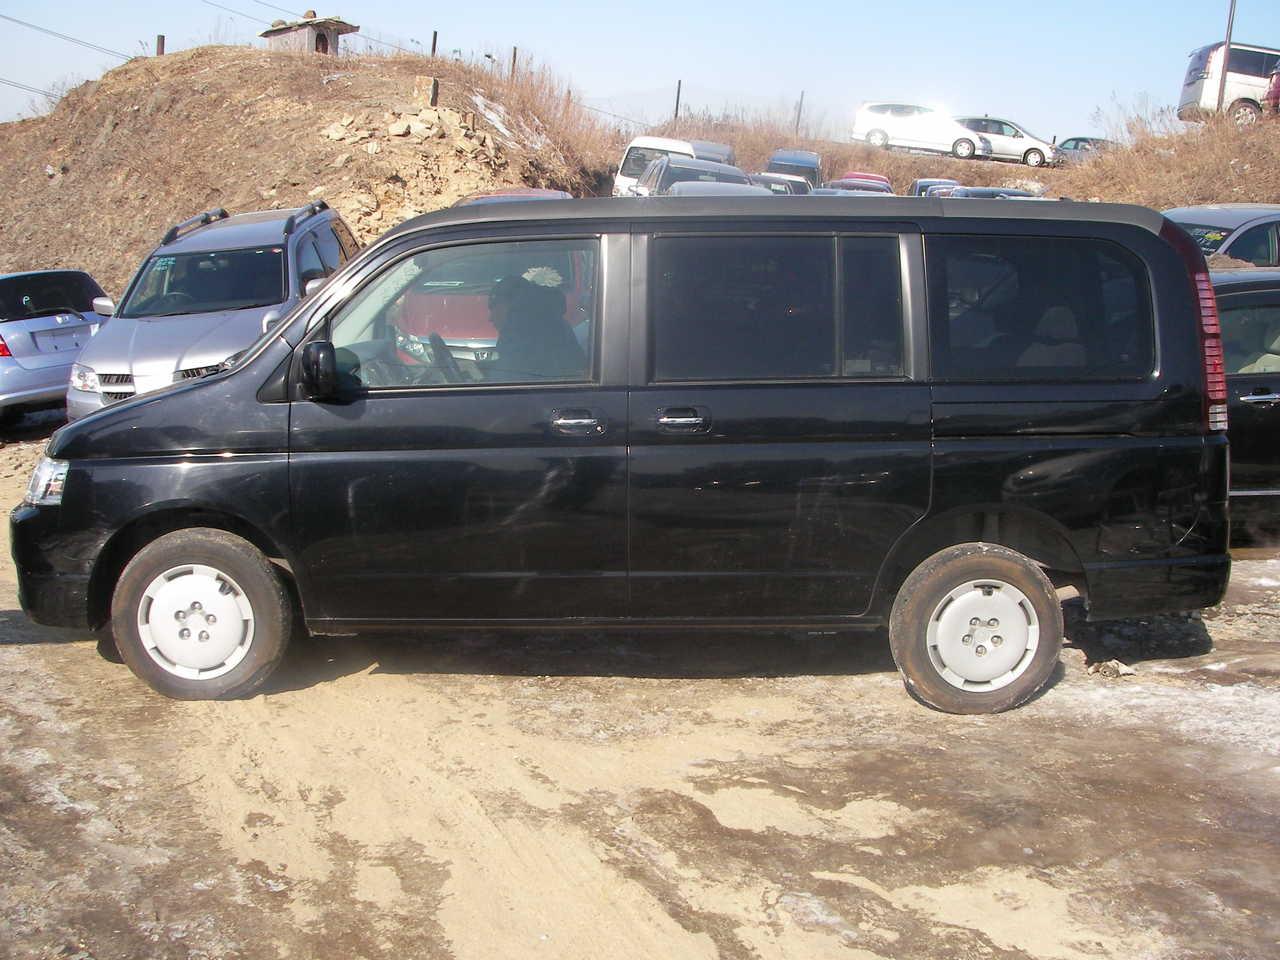 2003 Honda Stepwgn specs, Engine size 2.0, Fuel type Gasoline, Drive wheels 4WD, Transmission ...